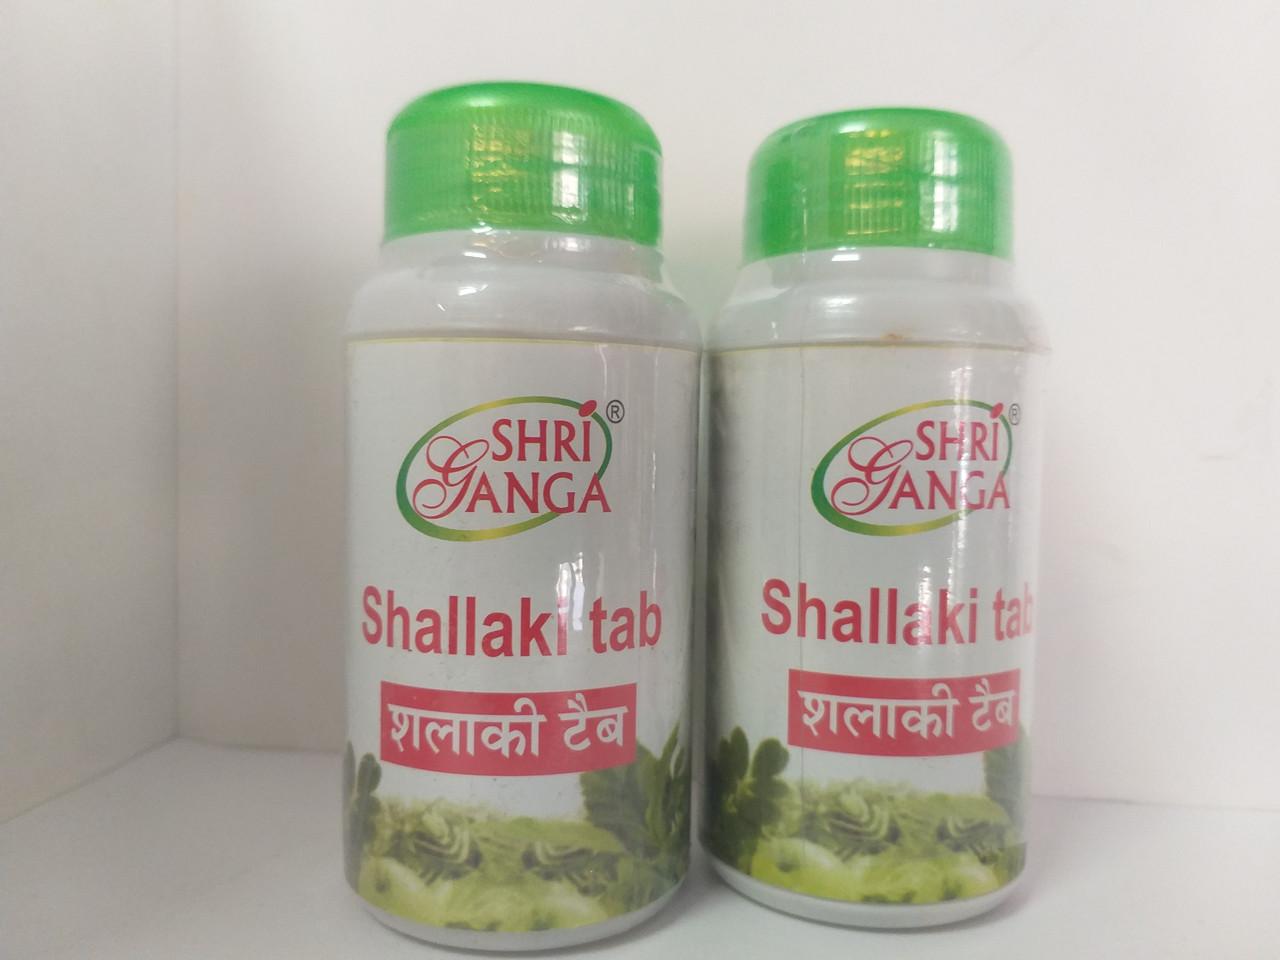 Шаллаки ,  (Shallaki Shri ganga), растительный препарат при артрите